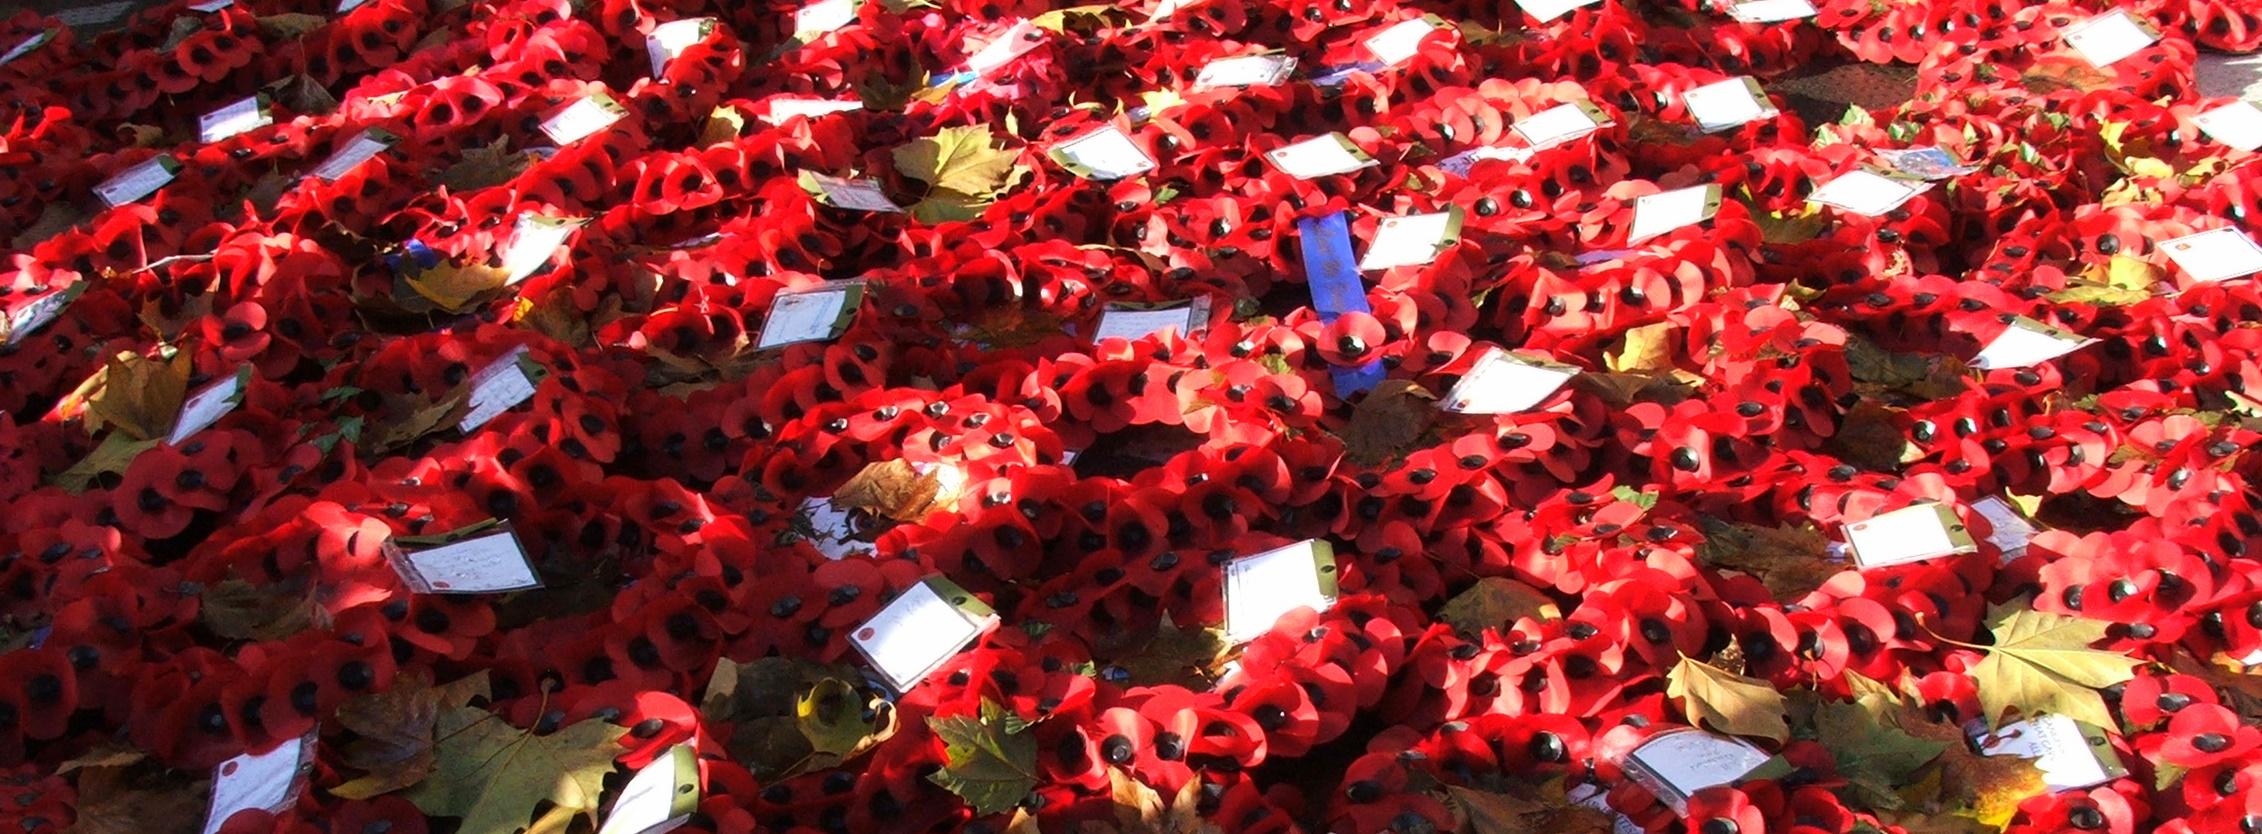 poppy-wreaths-1186064